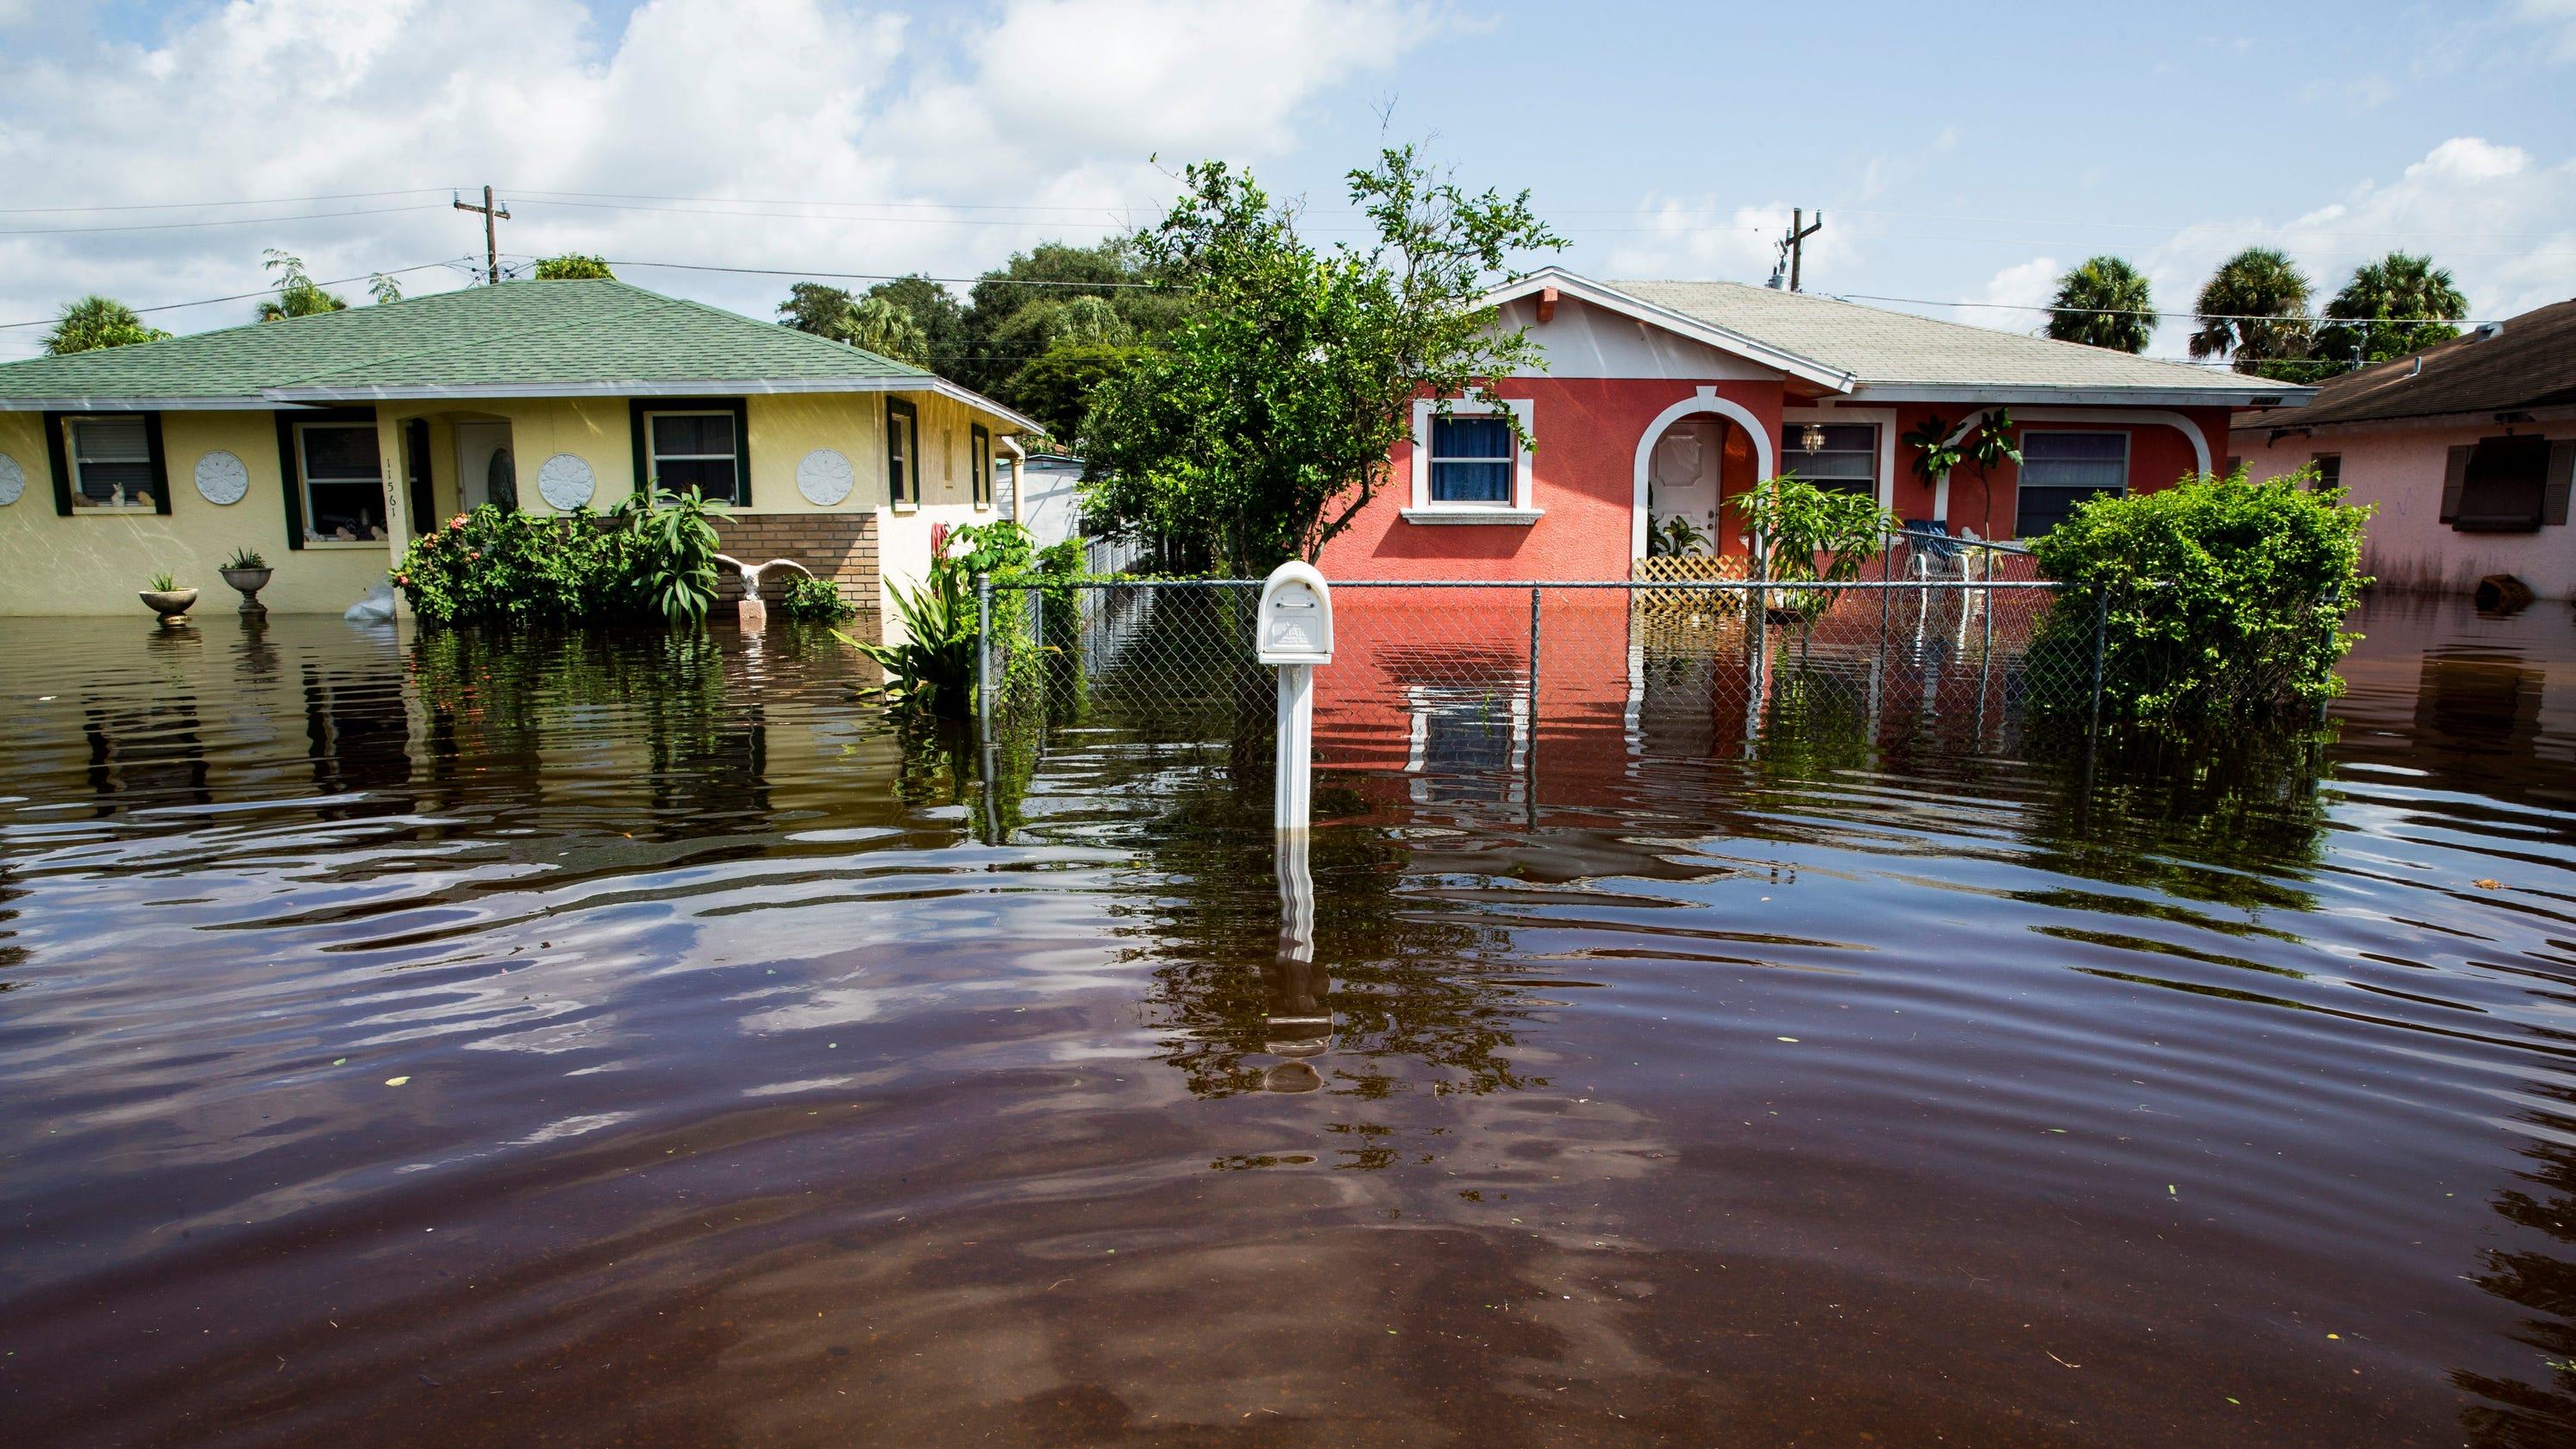 Bonita Springs program could buy homes flooded during ... on home macon ga, home jacksonville fl, home orlando fl, home bonita springs fl,